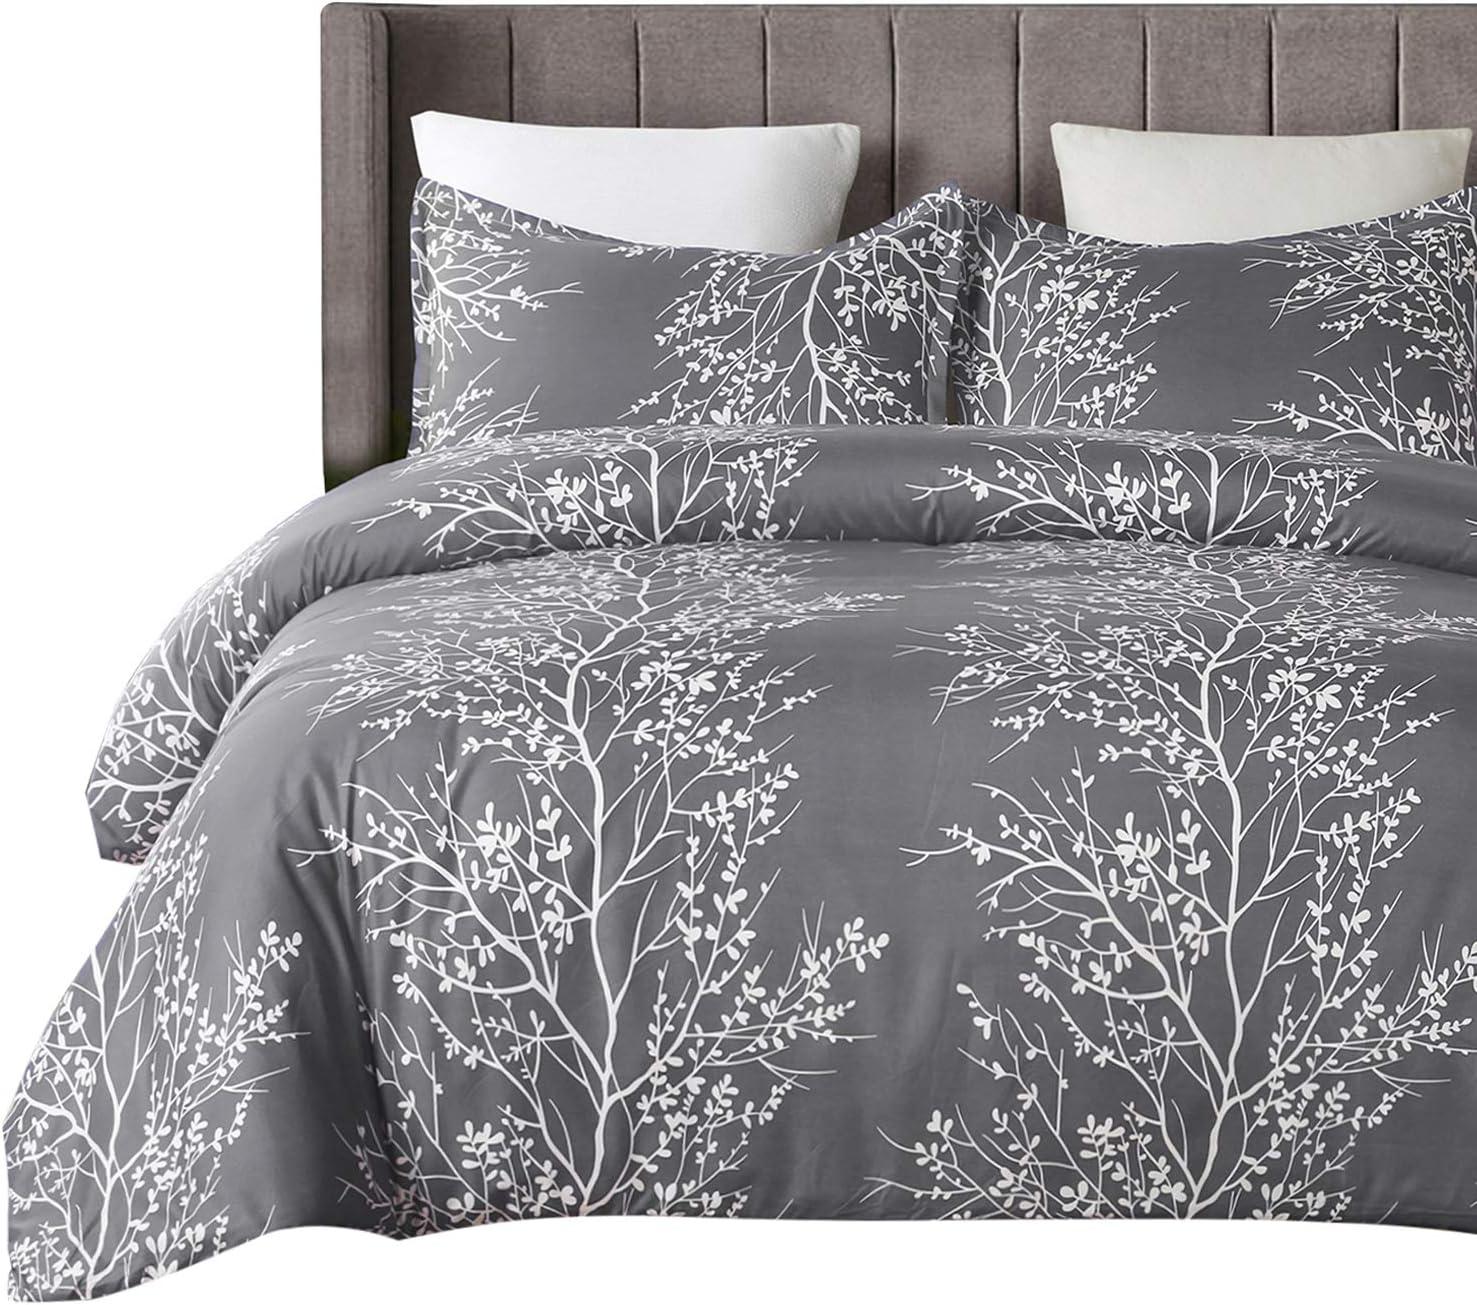 Amazon.com: Vaulia Lightweight Microfiber Duvet Cover Set, Grey